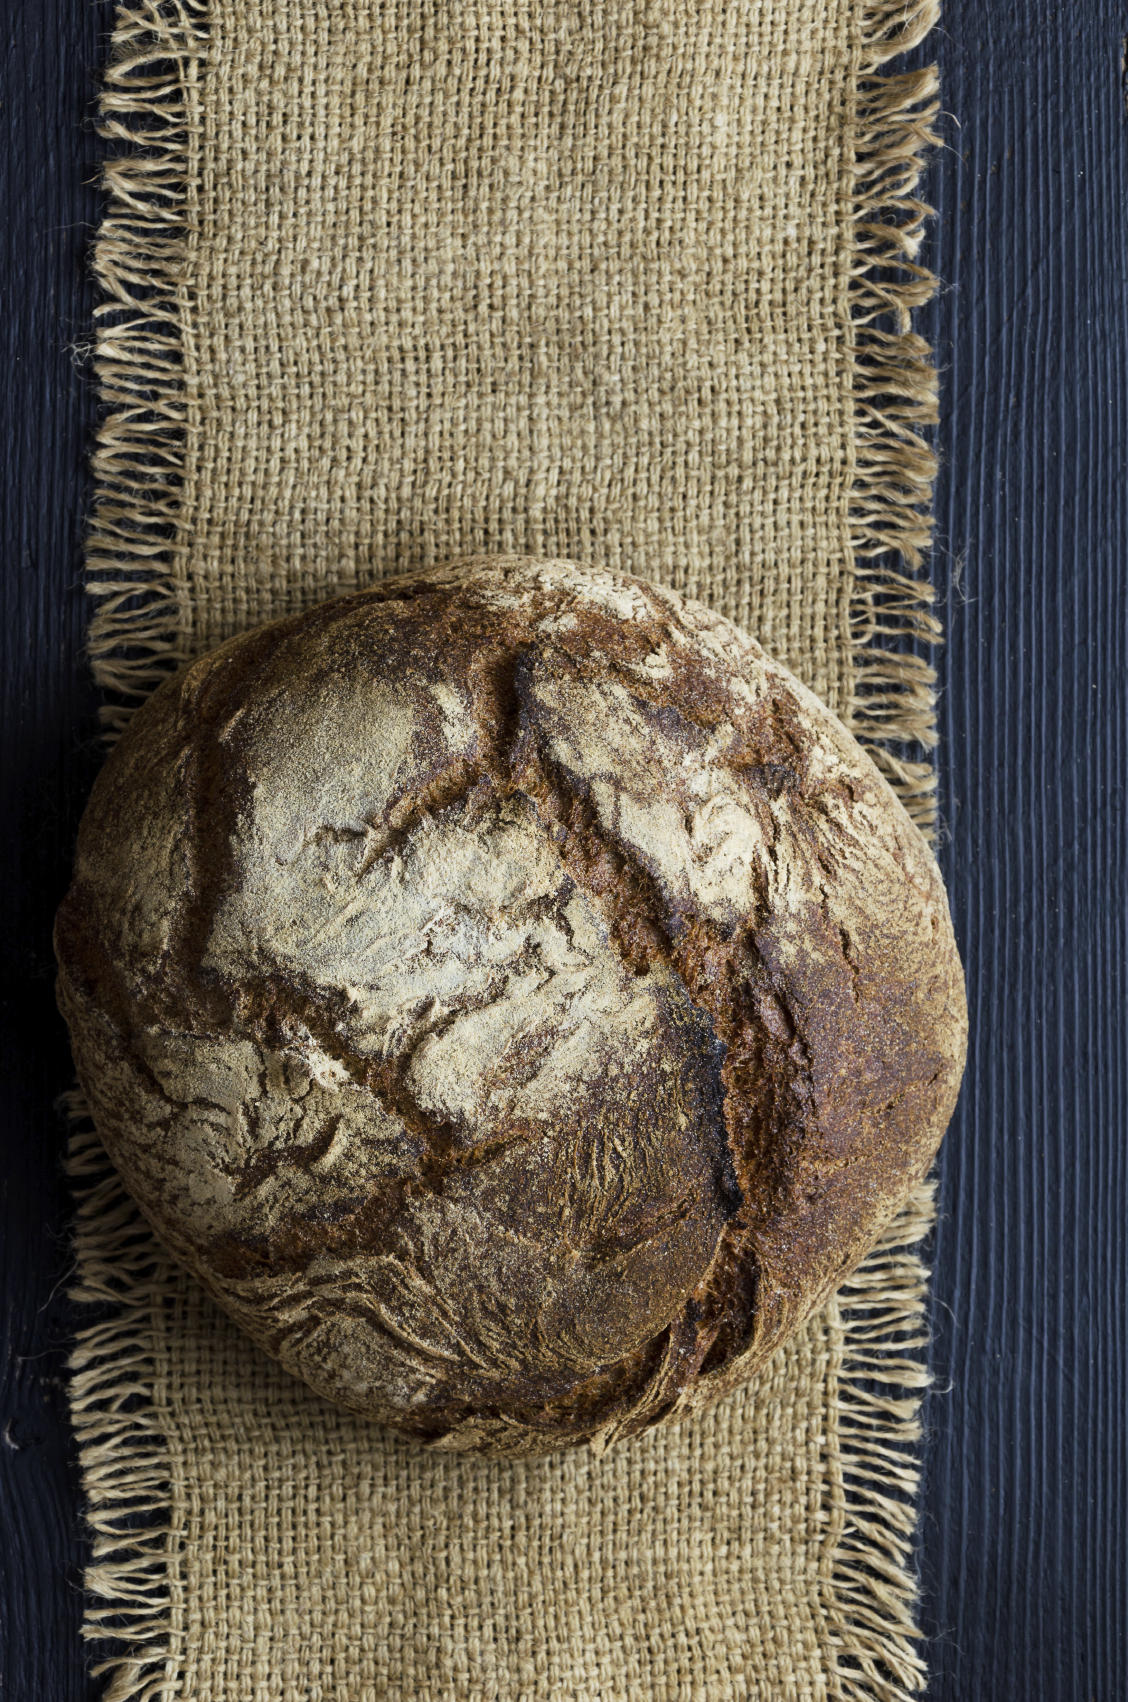 Pan de trigo y centeno